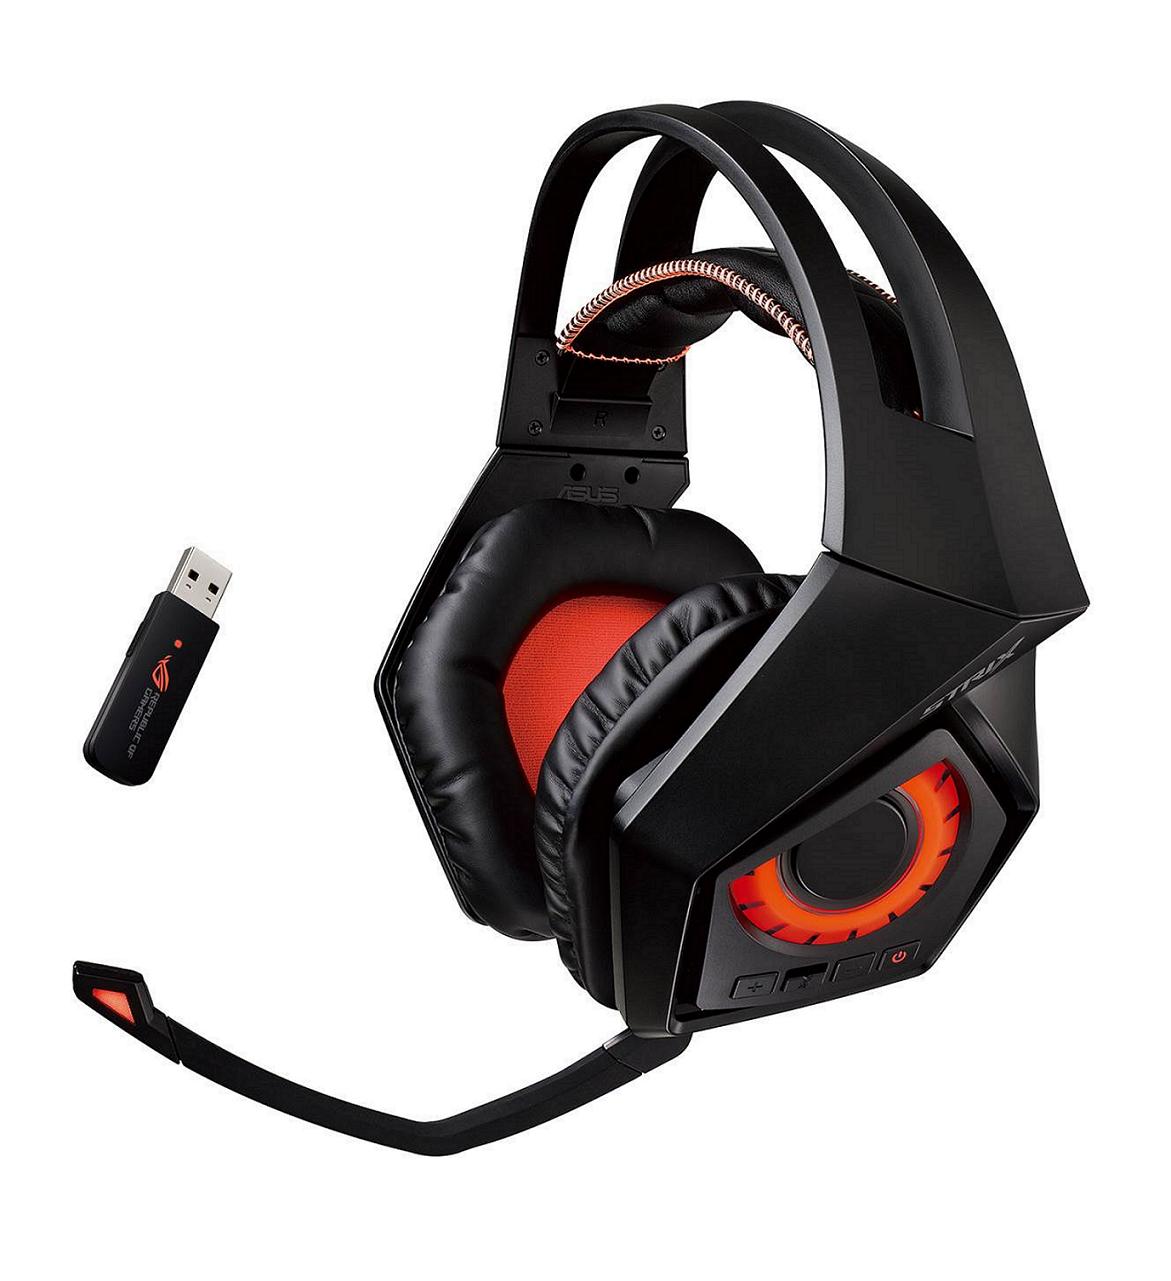 ROG STRIX Wireless無線電競耳麥採用2.4GHz無線技術,可提供低延遲音訊傳輸,玩家透過即時音效即可俐落察覺戰場動靜,取得絕佳優勢。